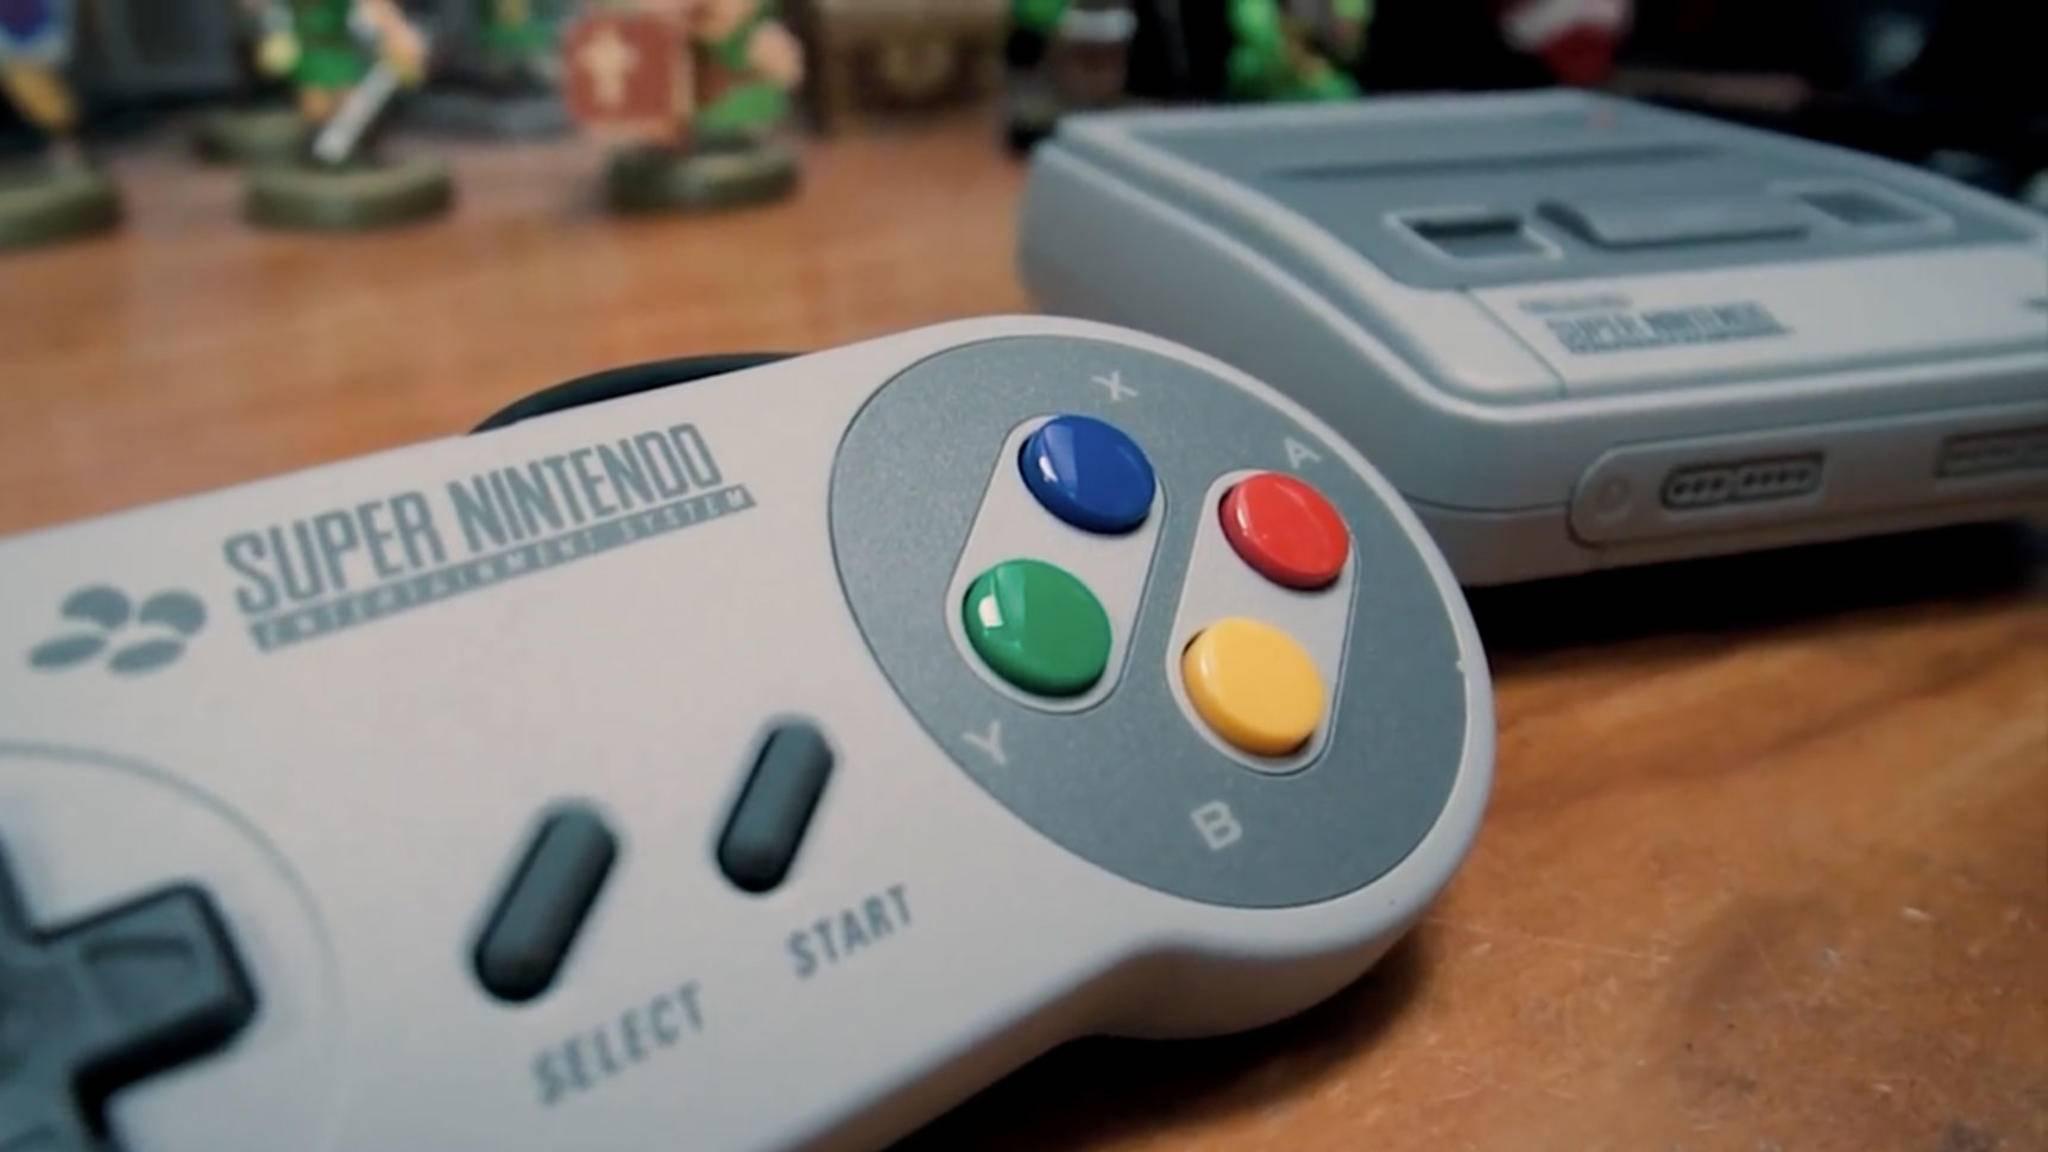 In wenigen Tagen feiert das SNES Classic Mini seinen Release.